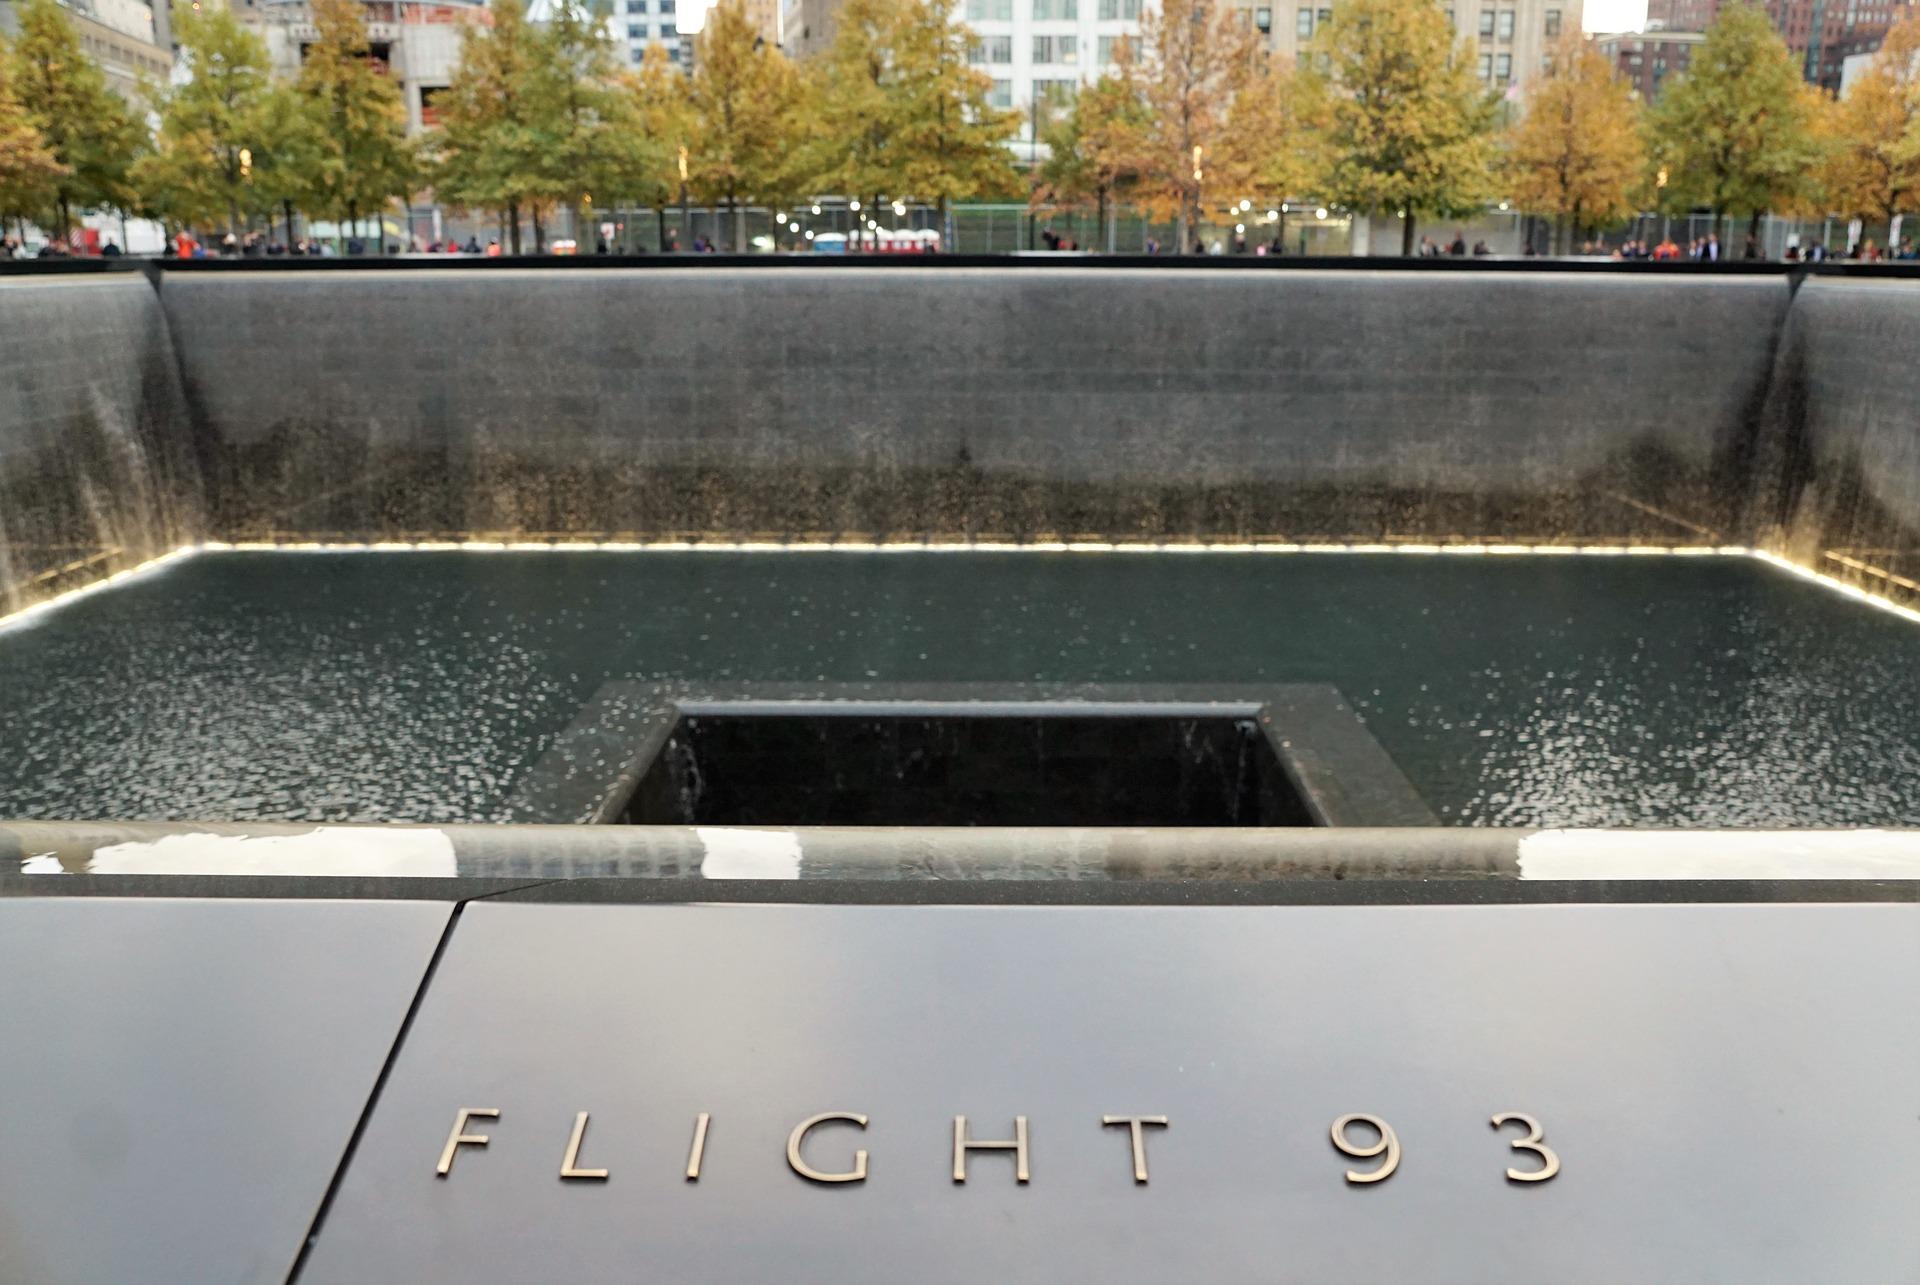 Flight 93 name at Ground Zero Memorial, New York City